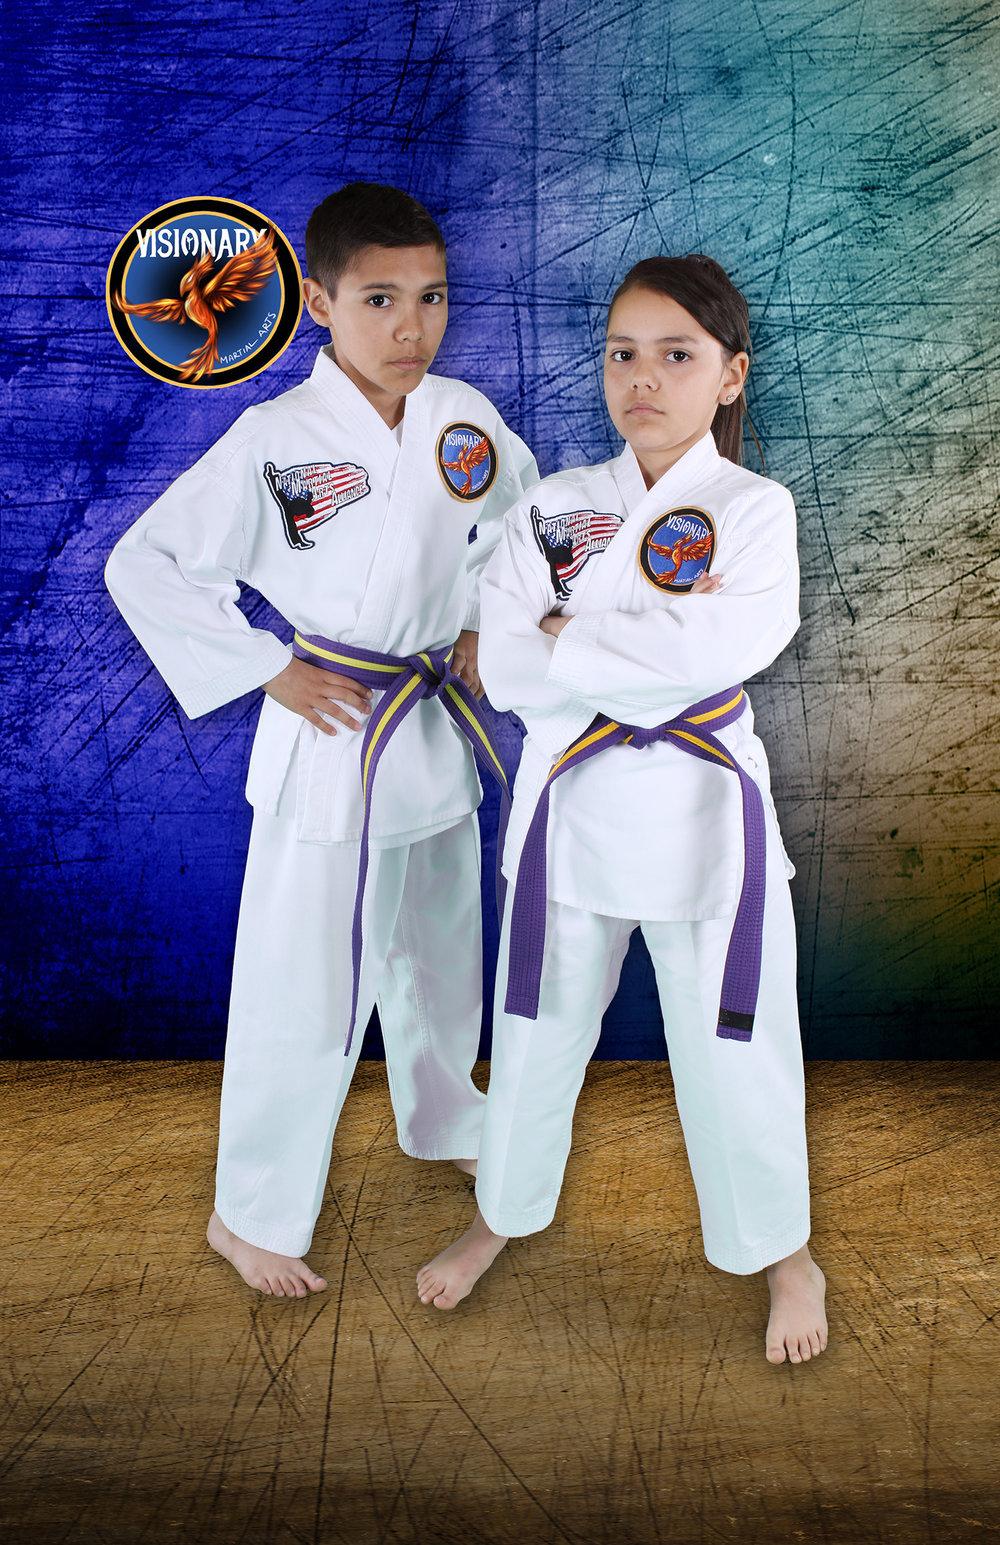 Alyssa and Krystopher Velazco 5751 1500.jpg